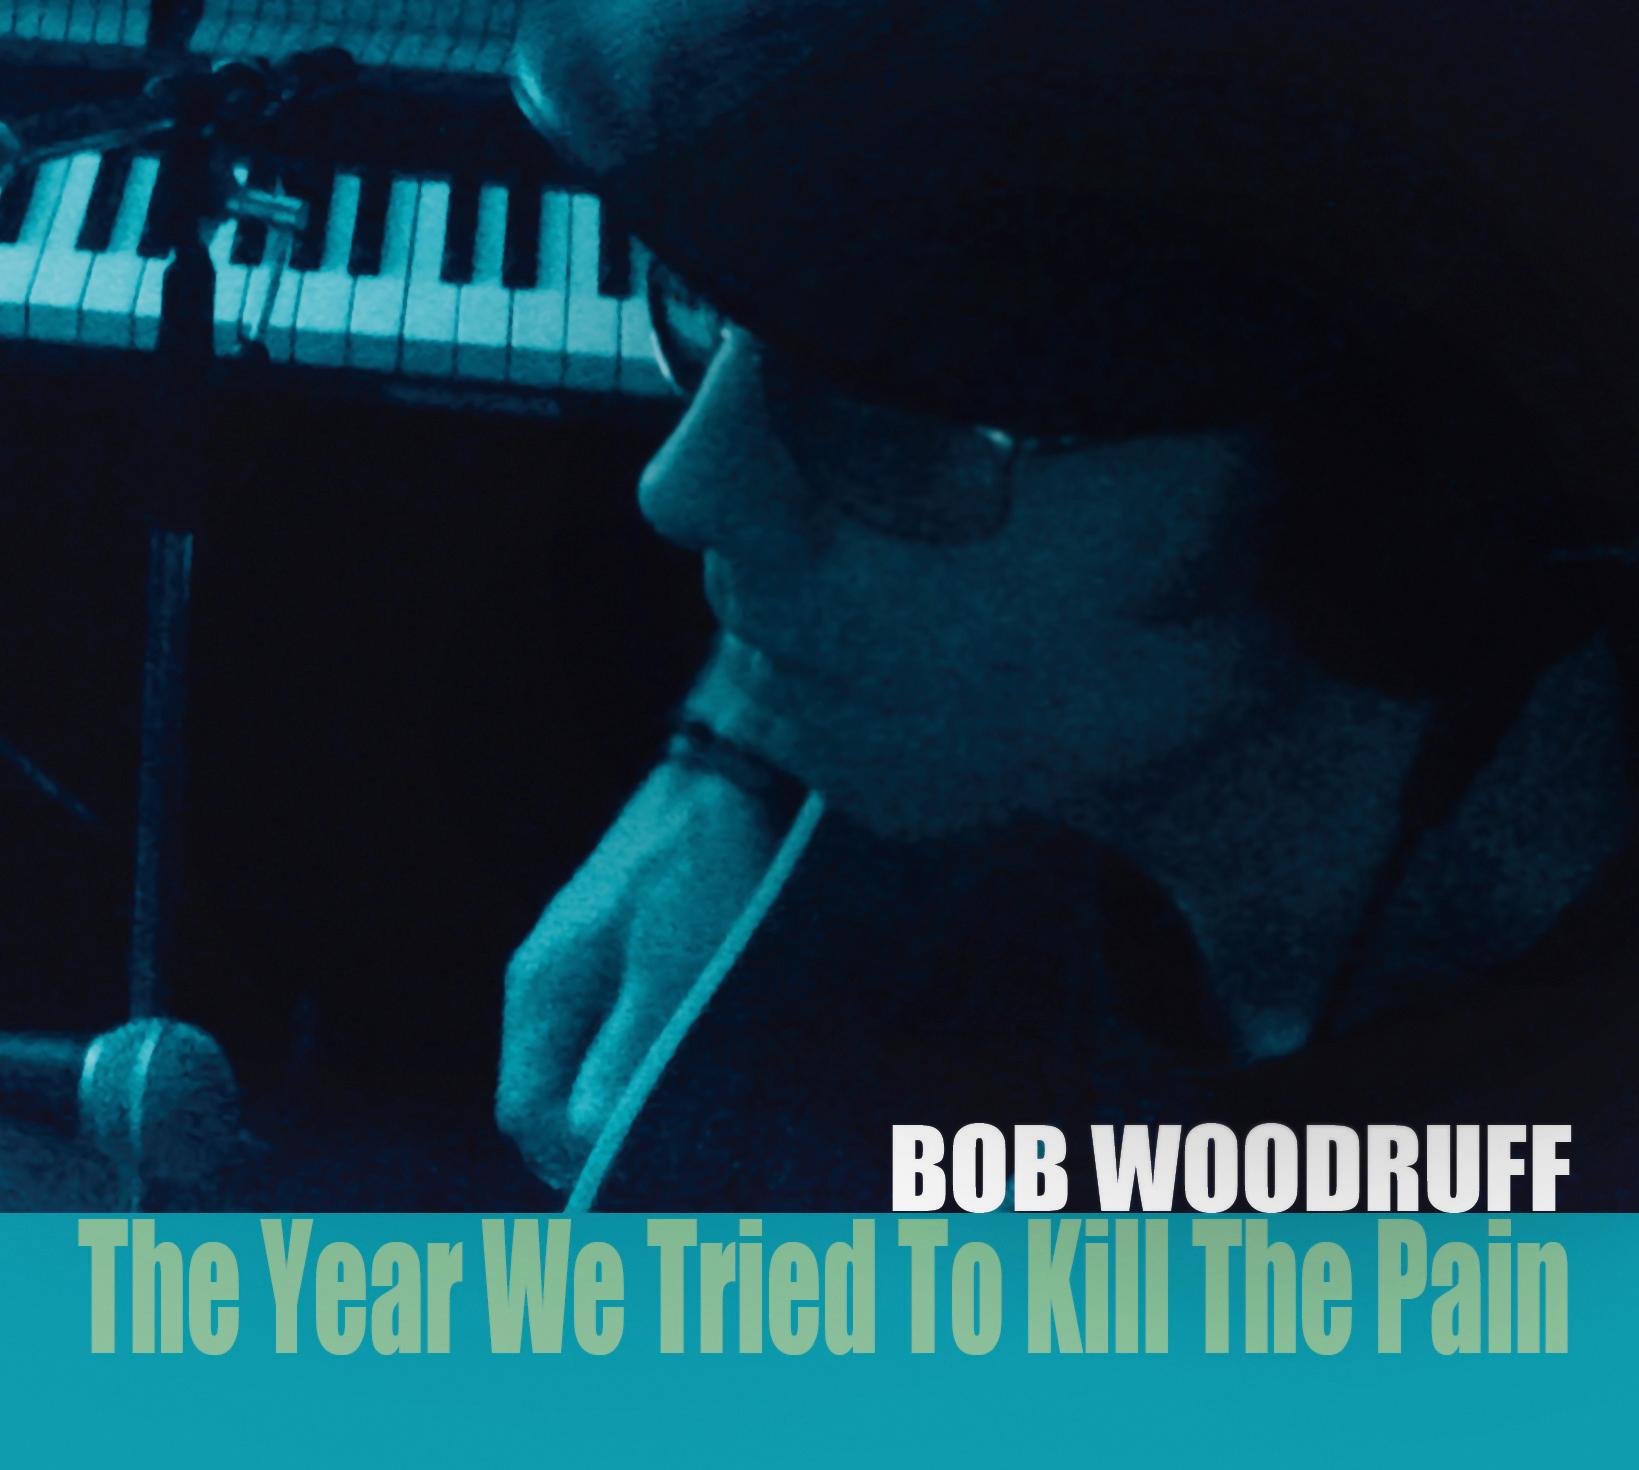 Bob Woodruff  The Year We Tried To Kill The Pain COVER.jpg